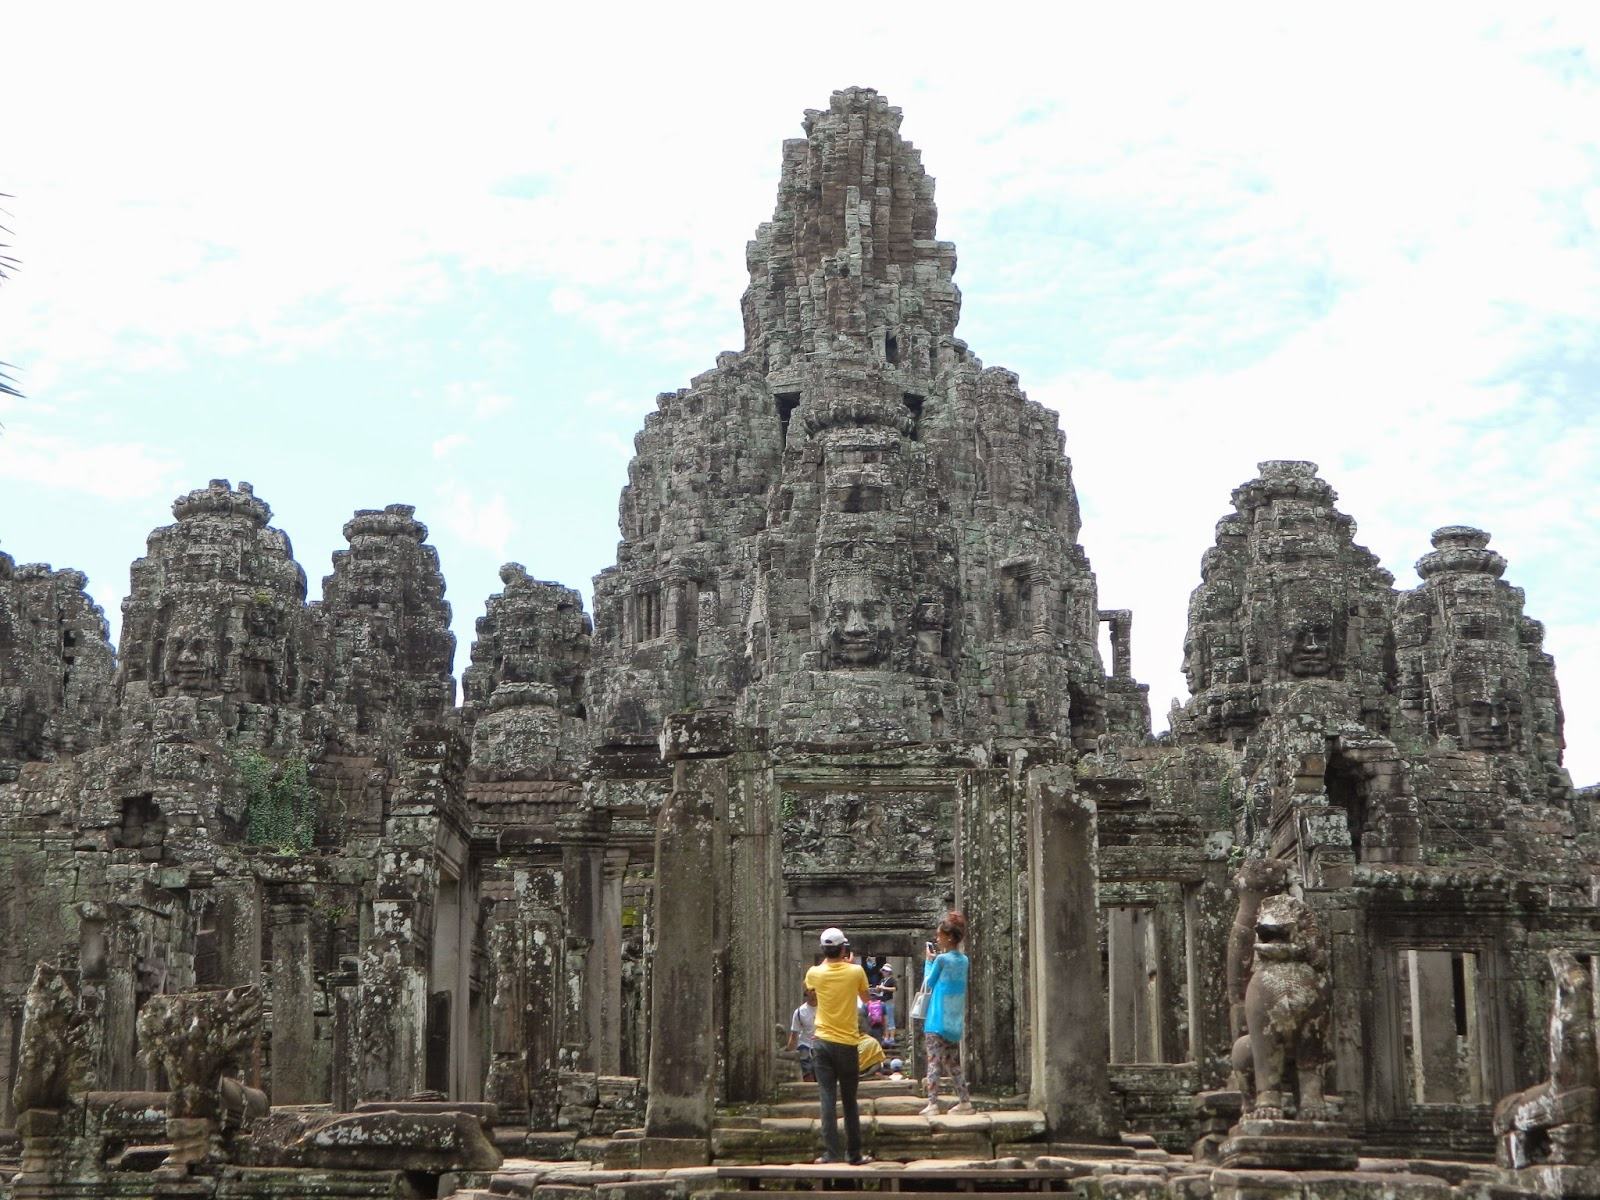 The Bayon Temple